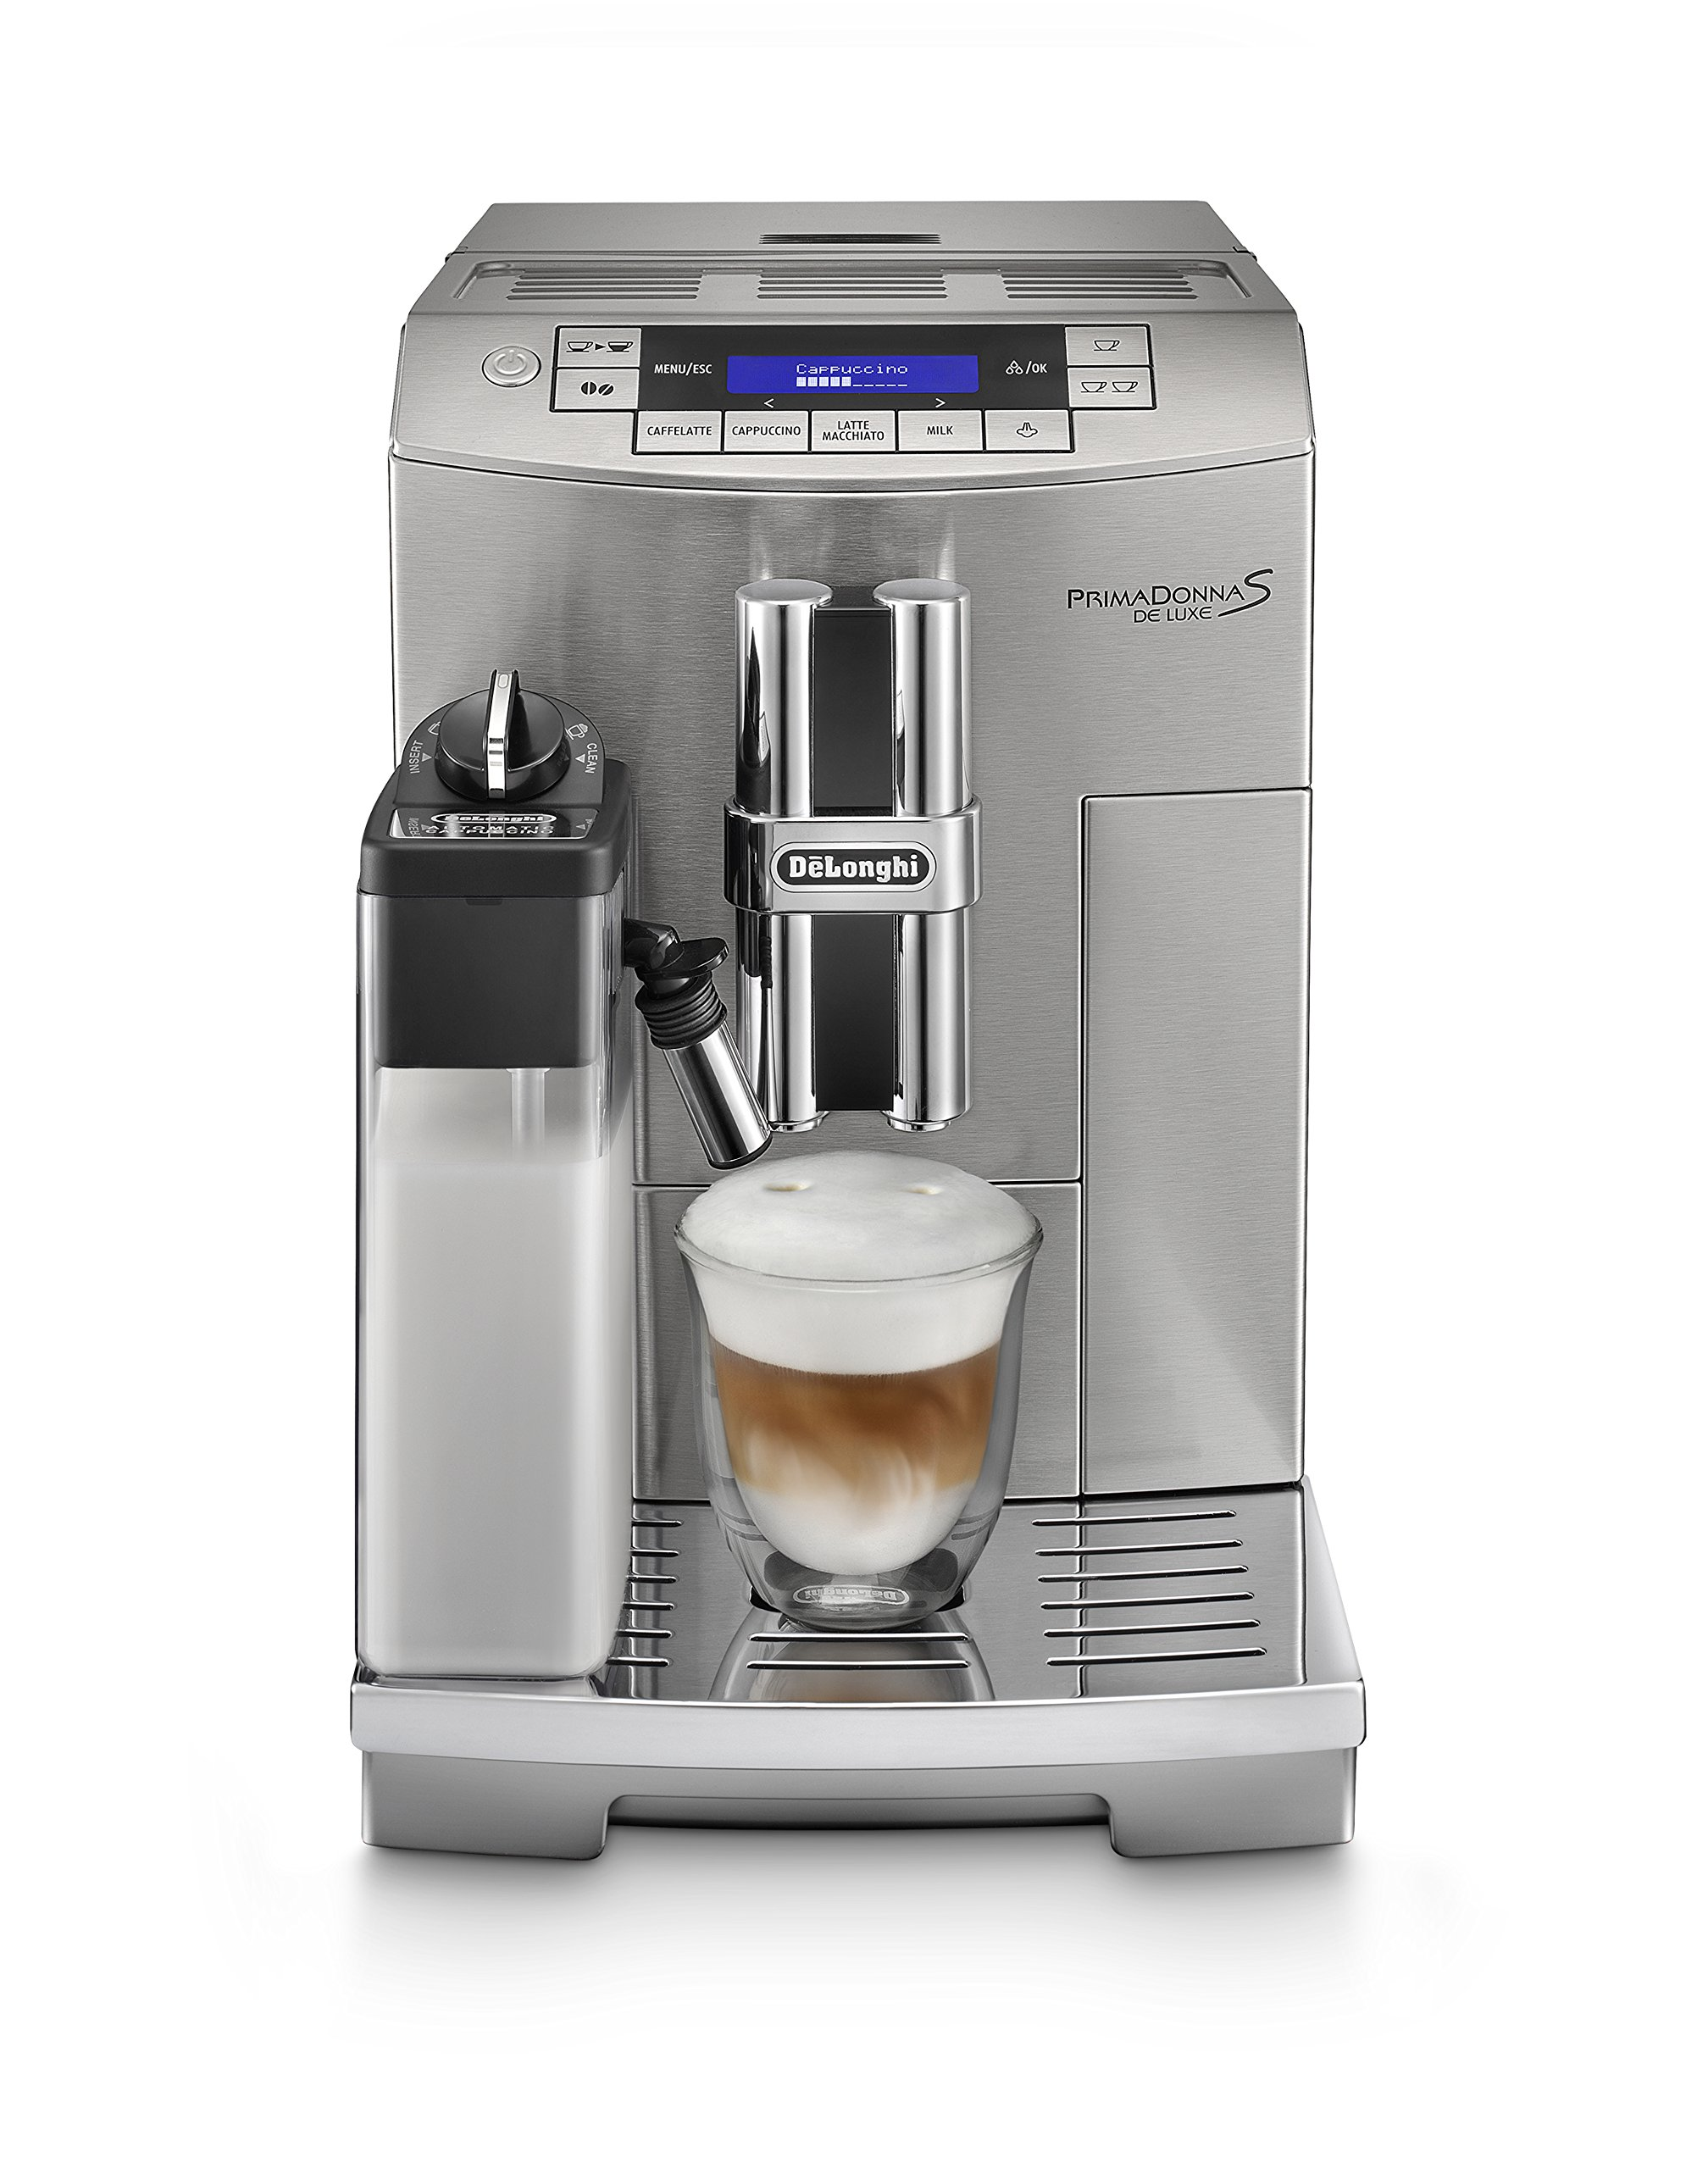 DeLonghi-PrimaDonna-S-De-Luxe-ECAM-28466M-Kaffeevollautomat-Digitaldisplay-integriertes-Milchsystem-Lieblingsgetrnke-auf-Knopfdruck-Edelstahlgehuse-2-Tassen-Funktion-silber